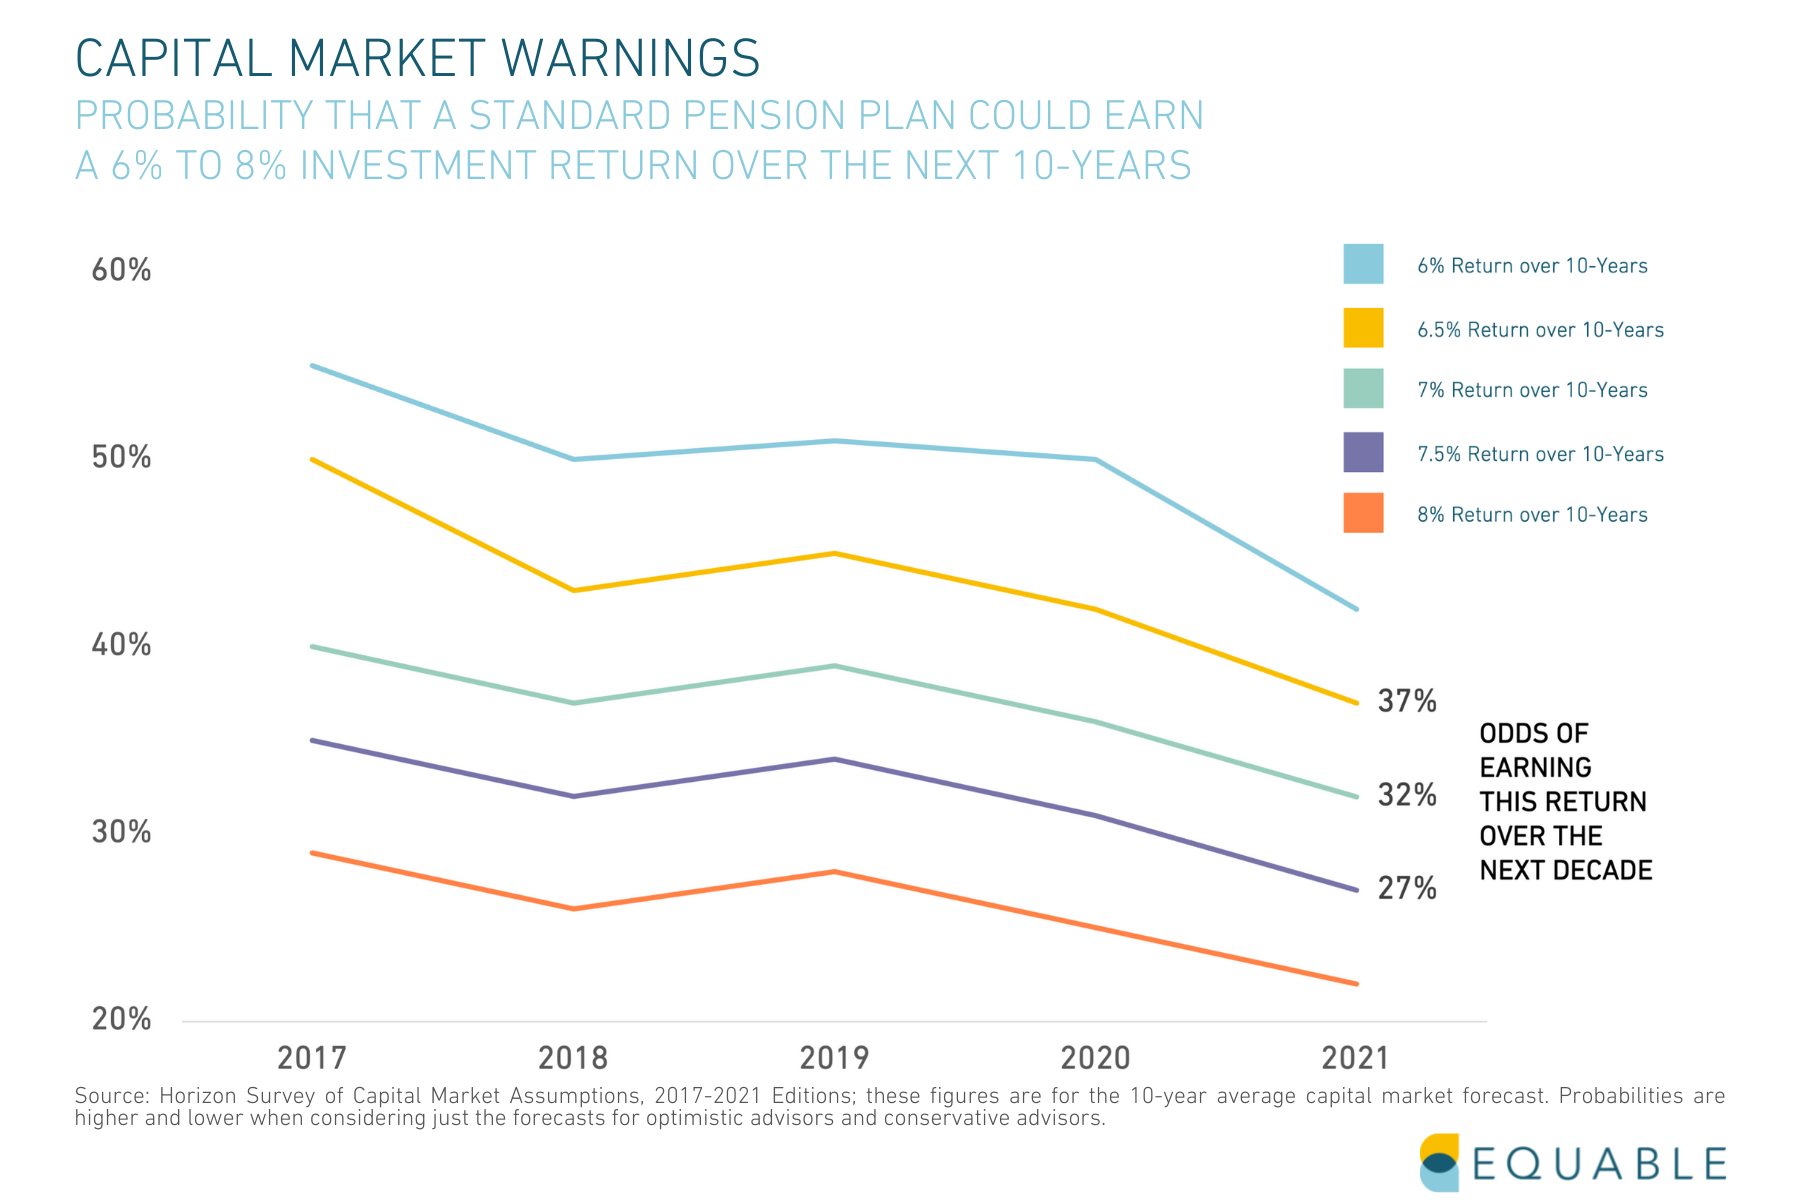 Capital Market Forecast Warnings 2021